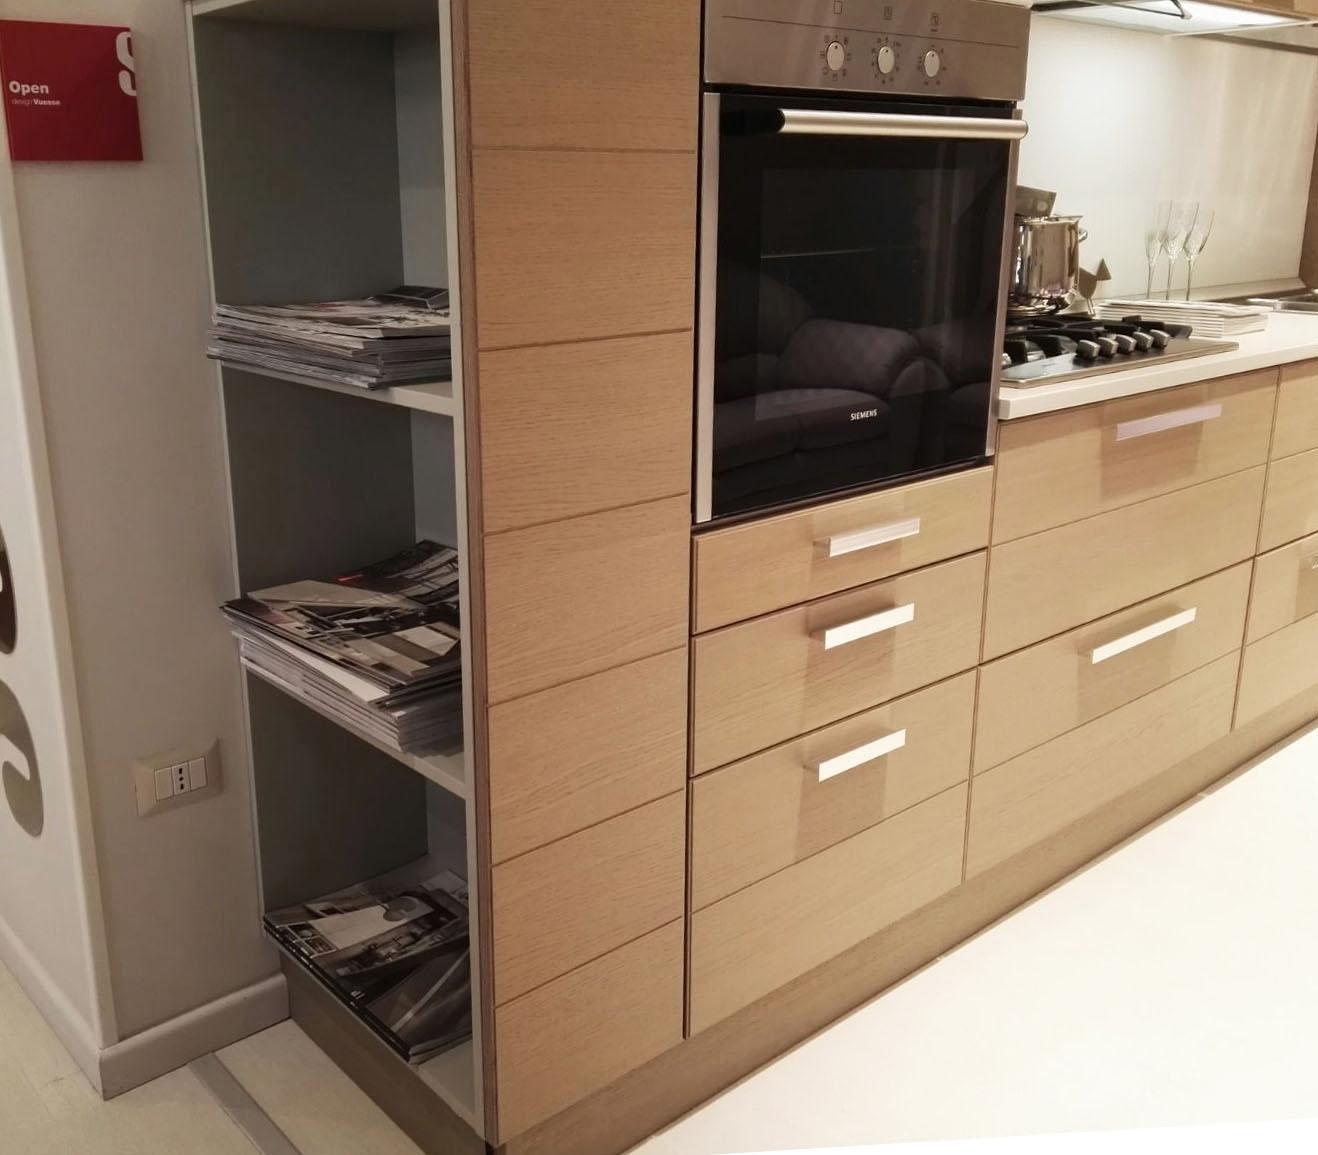 Cucina scavolini open moderna legno cucine a prezzi scontati - Legno per cucine ...